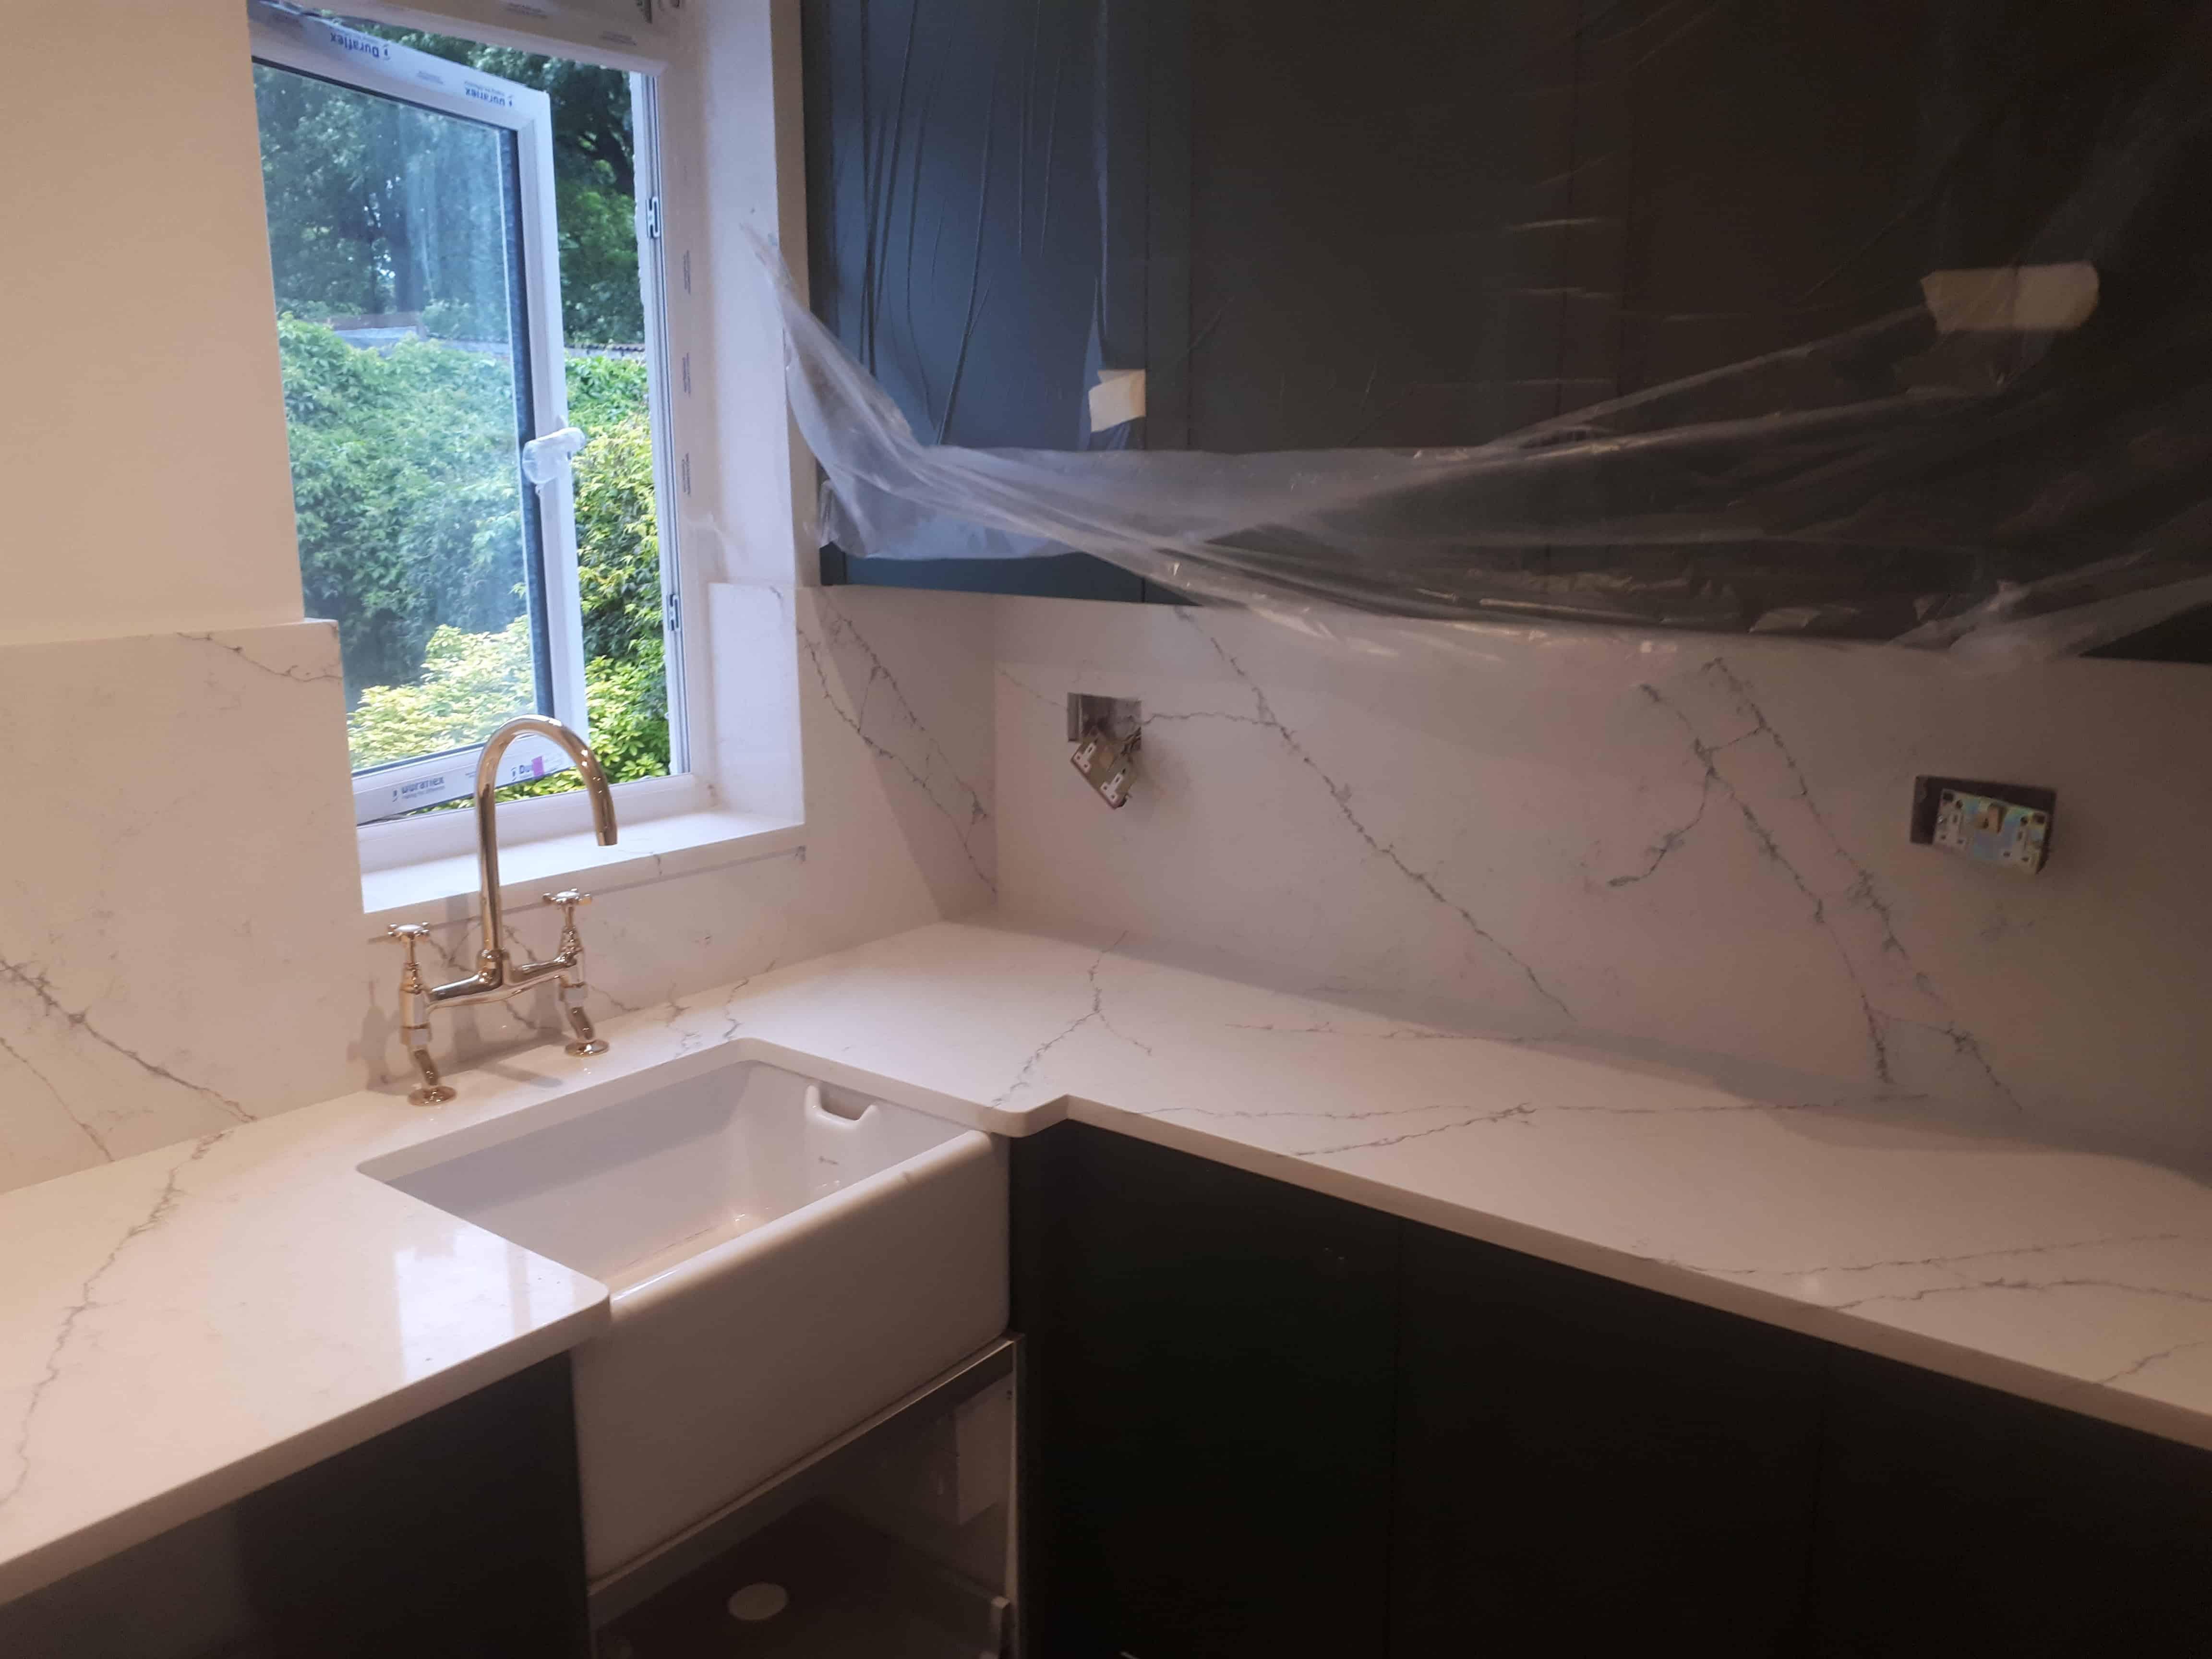 alaska bianco, classic alaska bianco, classic quartz alaska, quartz worktops London, granite worktops London